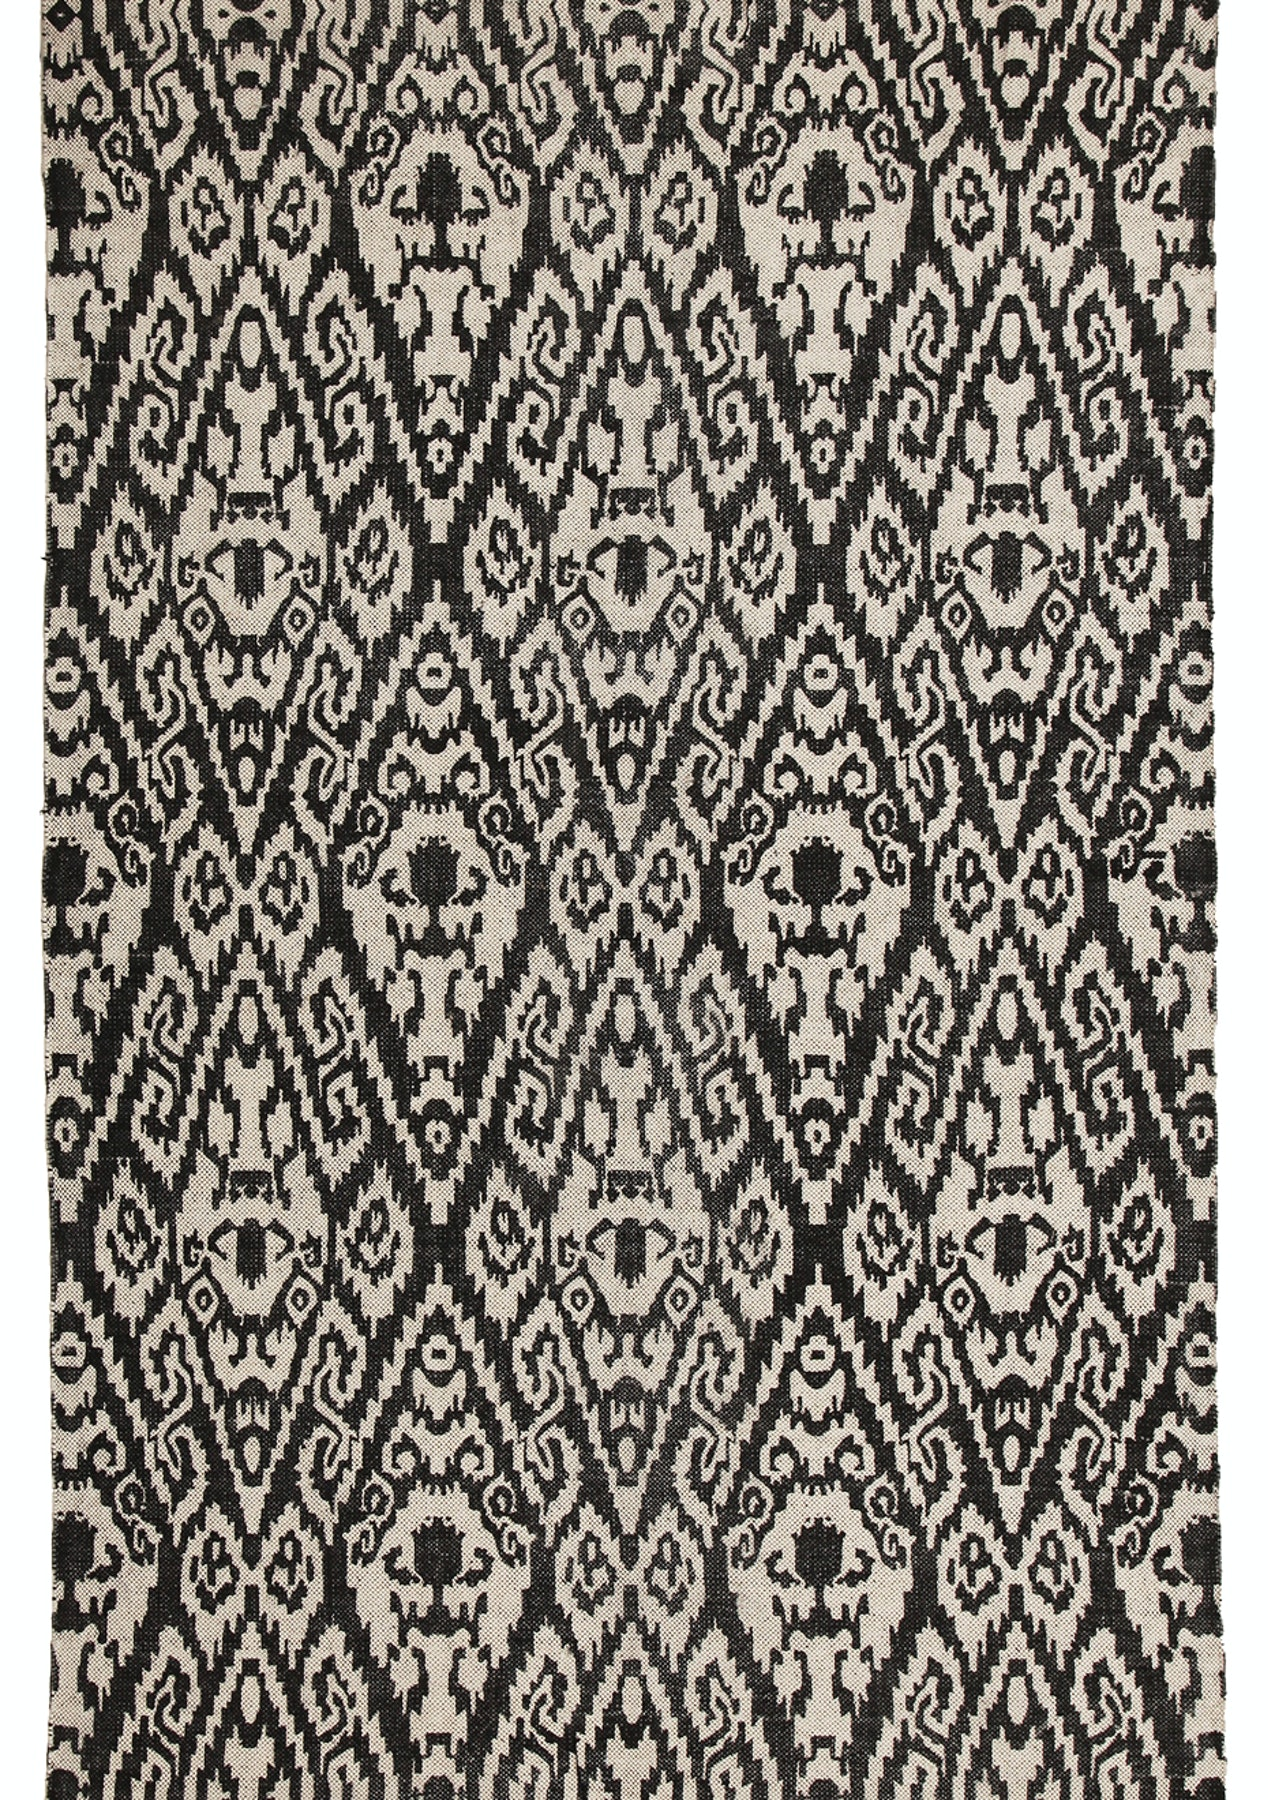 Logan b w stonewashed cotton tribal ikat fringed rug 270x180cm rugs 299 under onceit